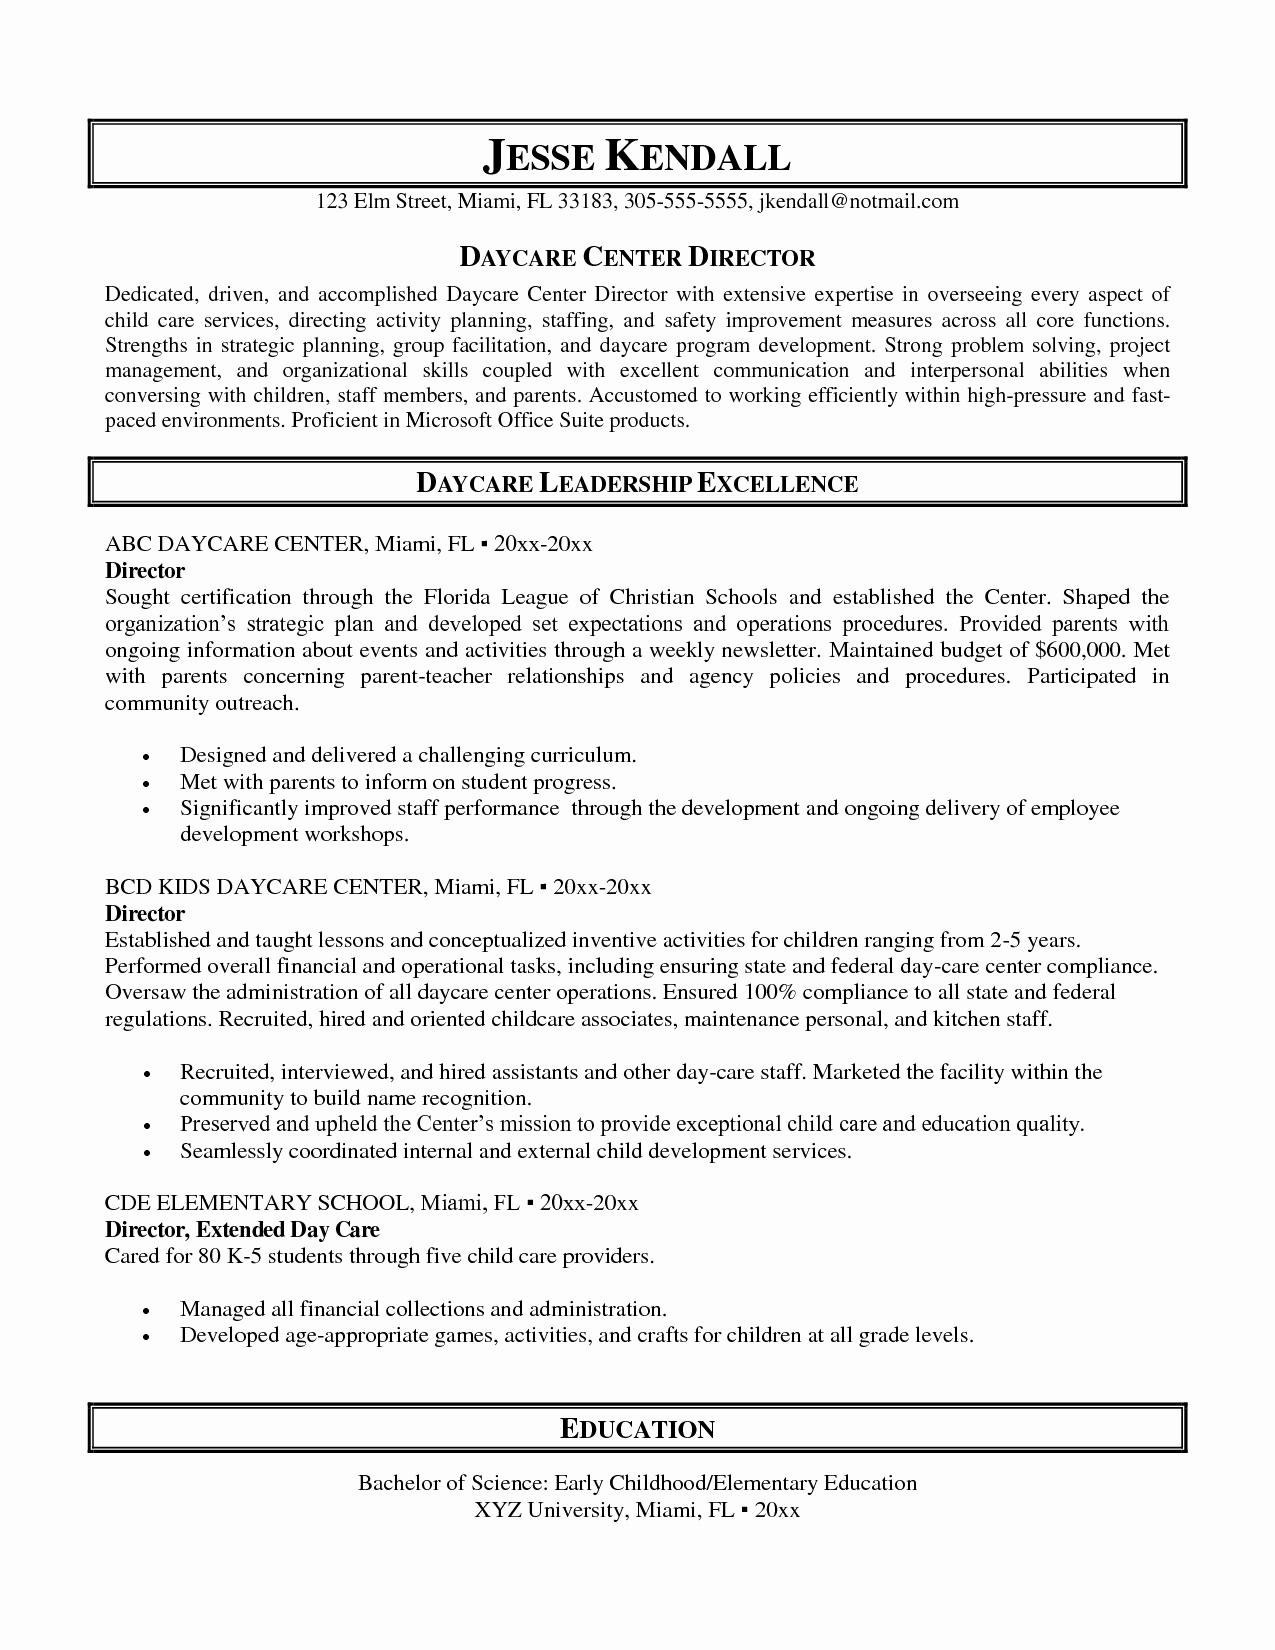 Impressive Sample Resume for Daycare Worker Also Child